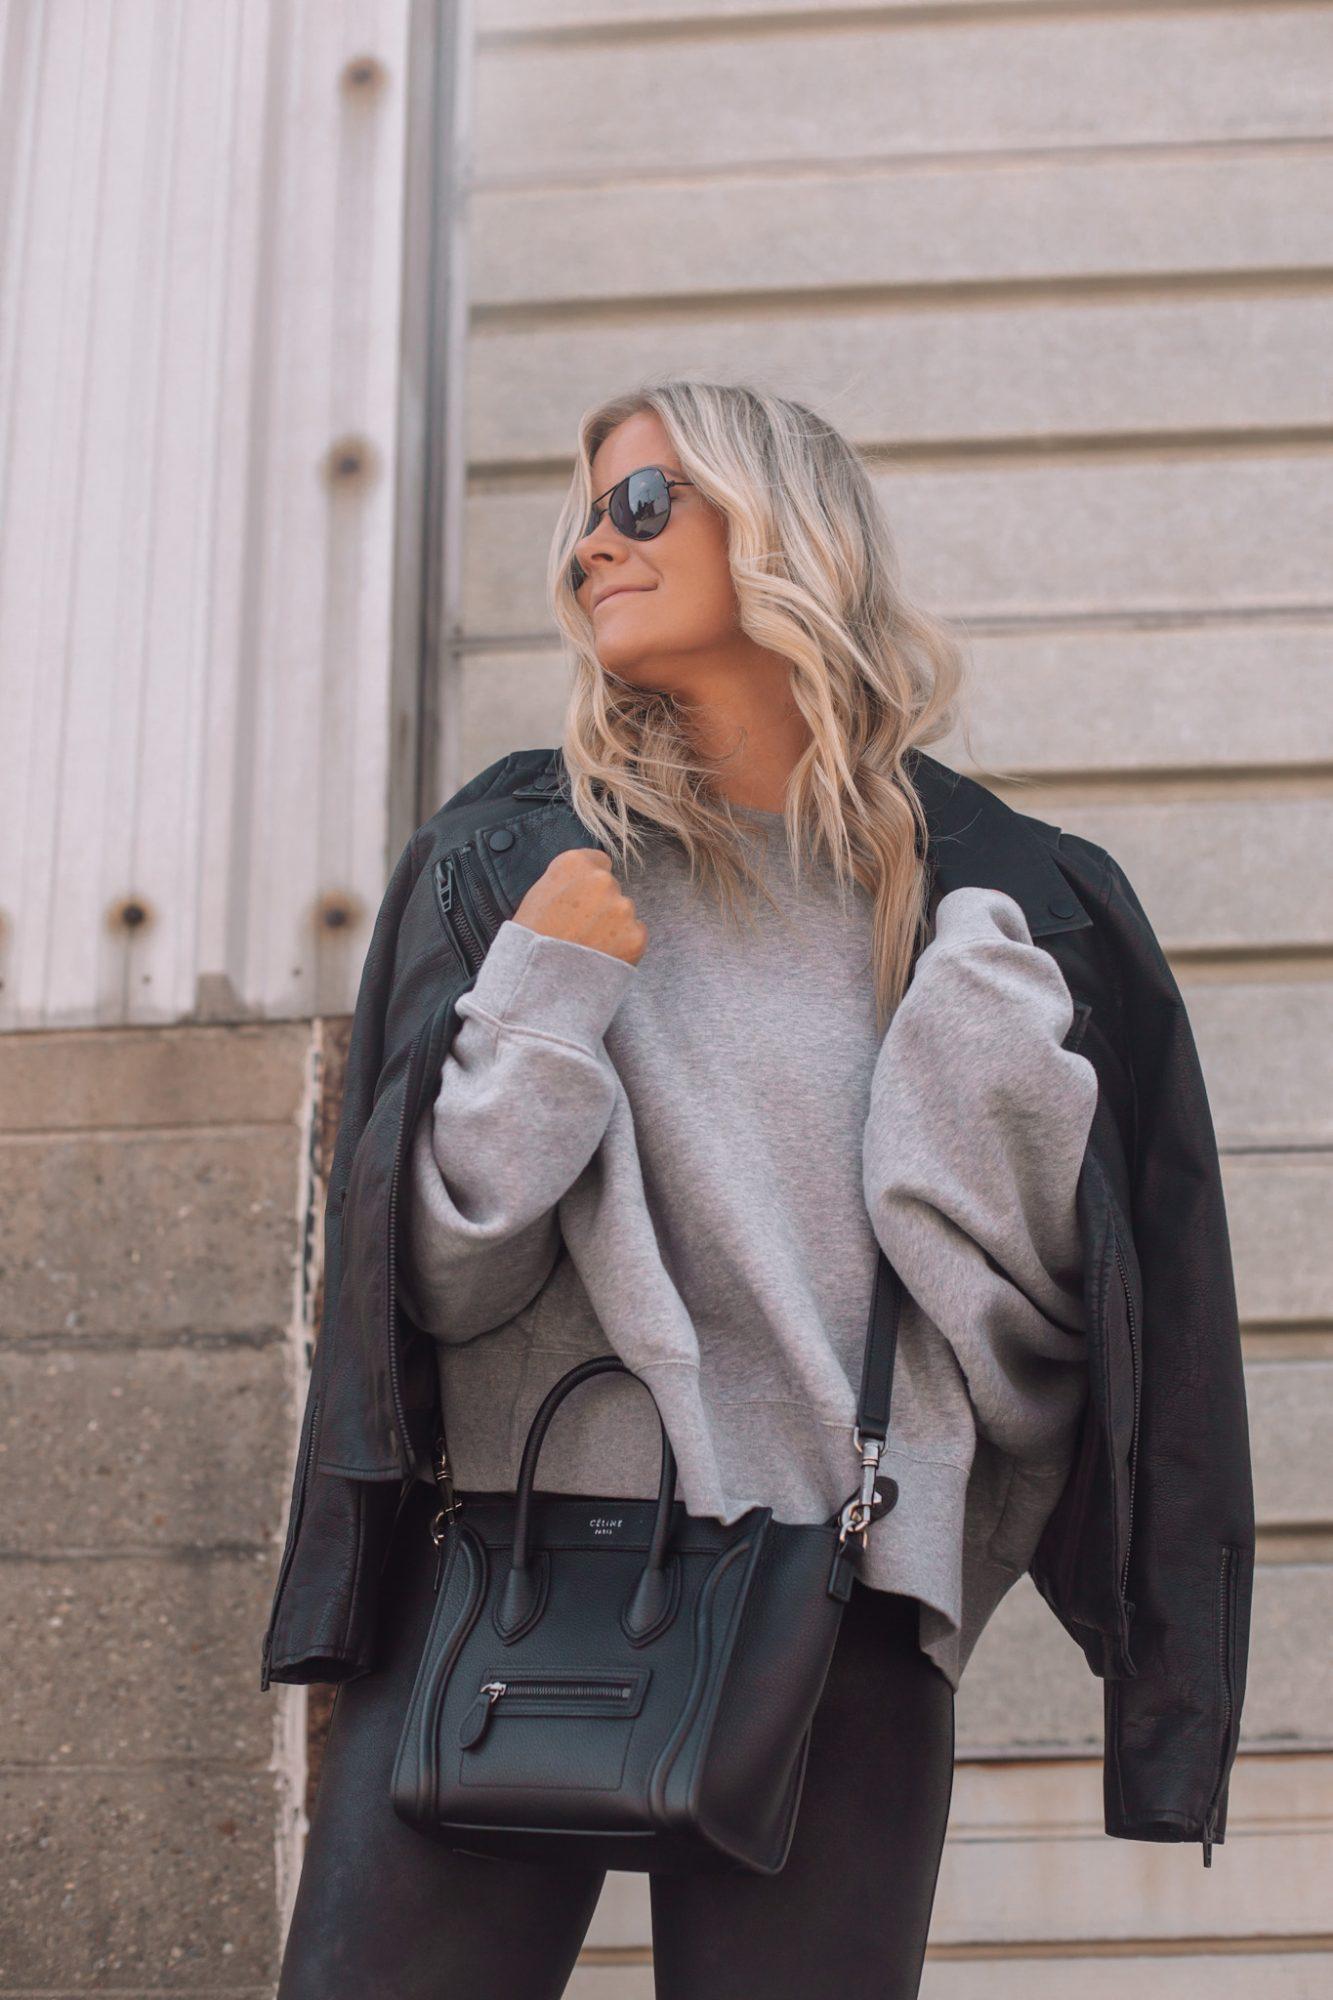 Faux Leather Leggings - Fall Outfit Idea- Athleisure- Ashley Pletcher- Black Aviators